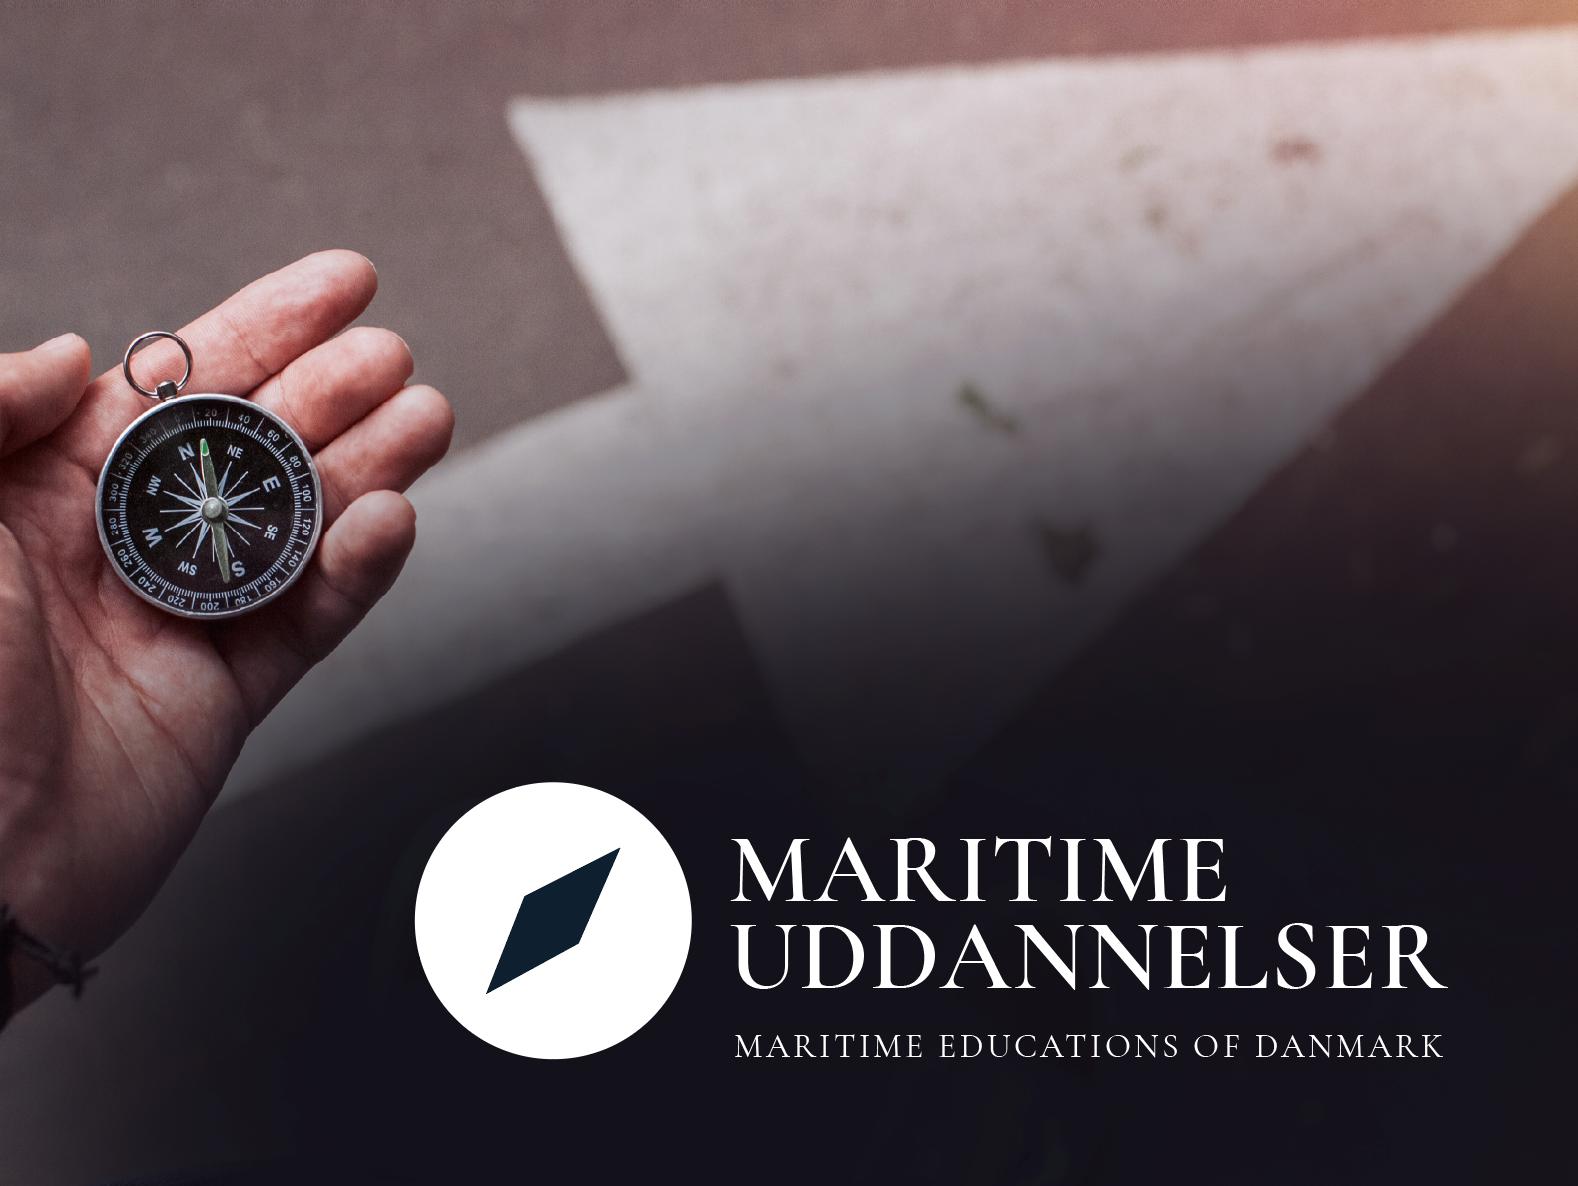 maritime uddannelser Malene Kyed logodesign logo design_